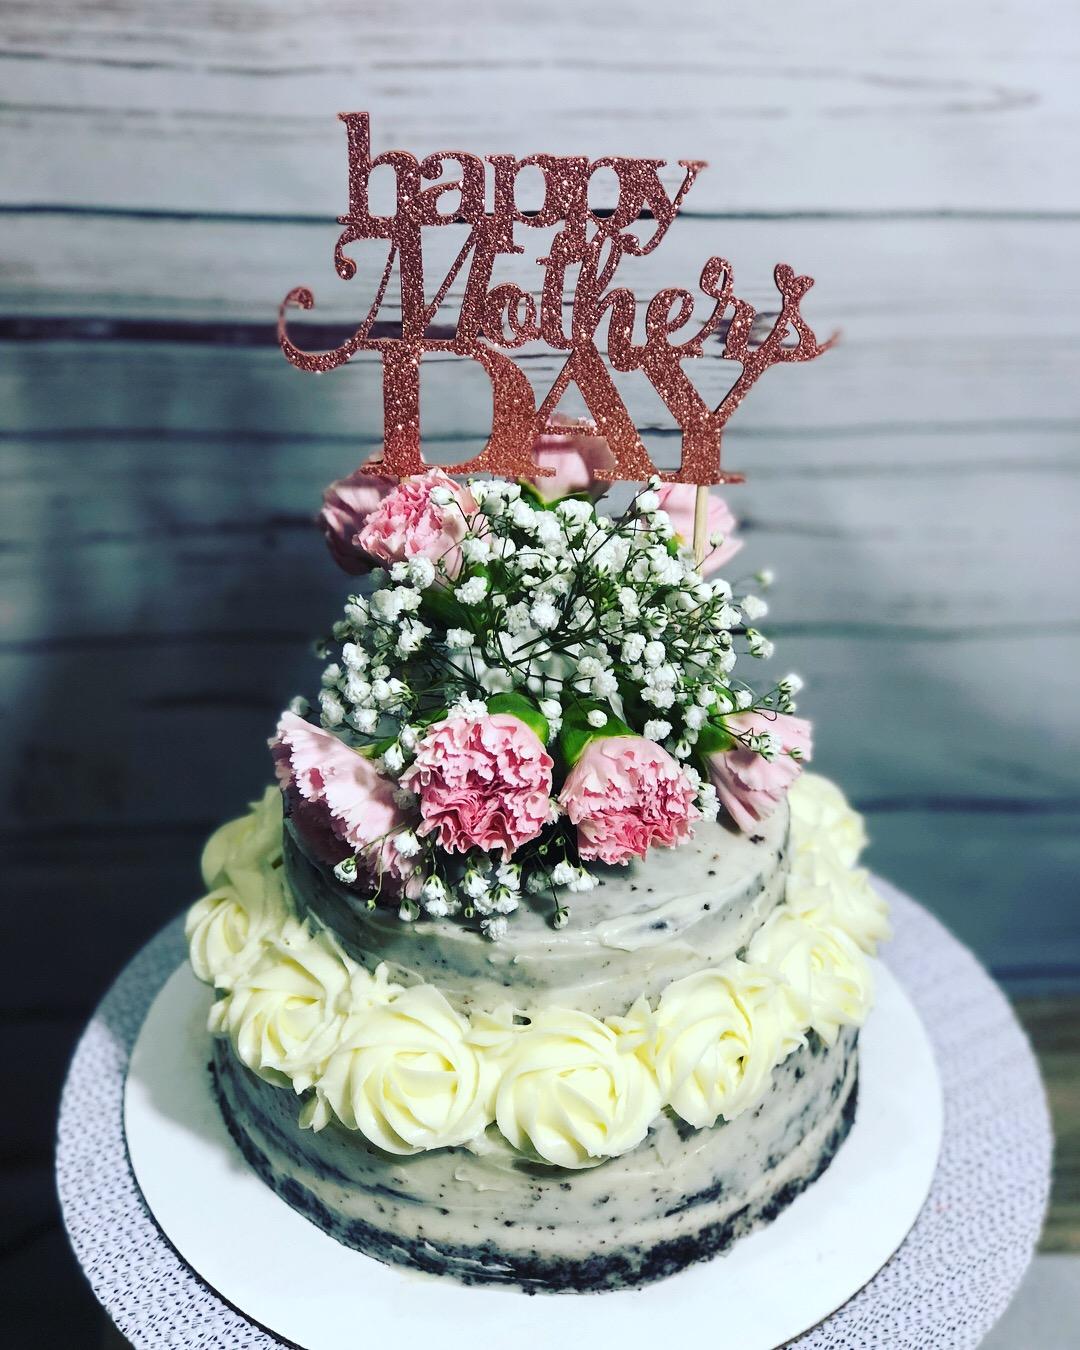 紅絲絨蛋糕(Red Velvet)